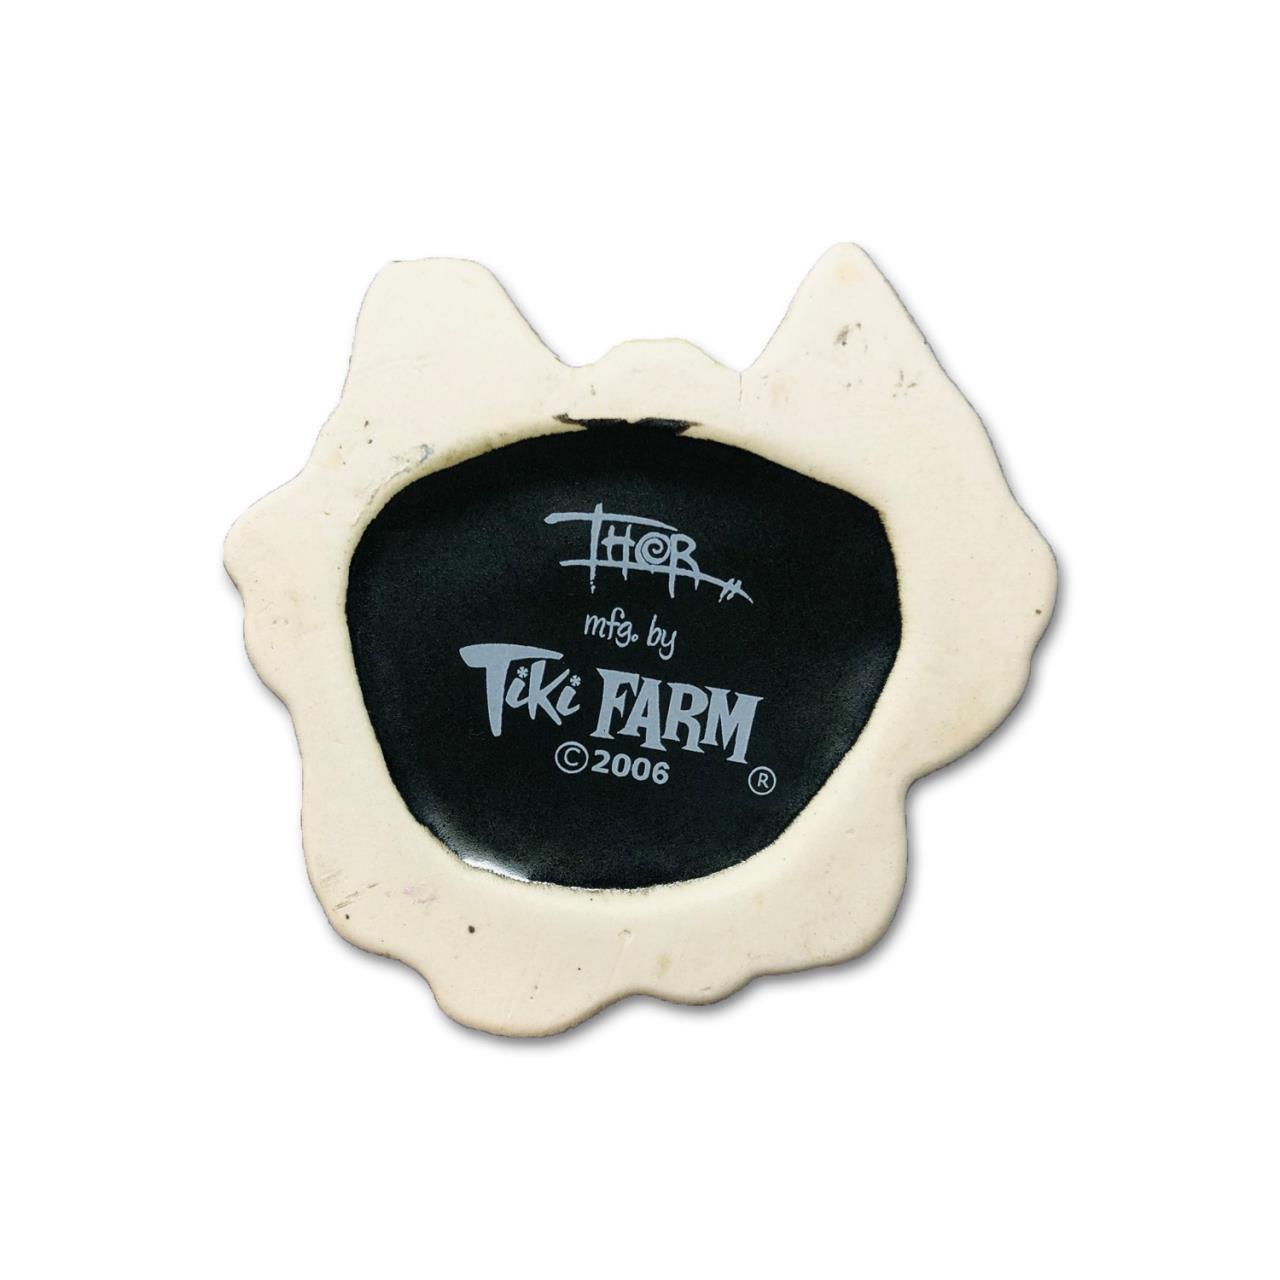 2006 Tiki Farm Jivaro Shrunken Head Tiki Mug By: Thor -